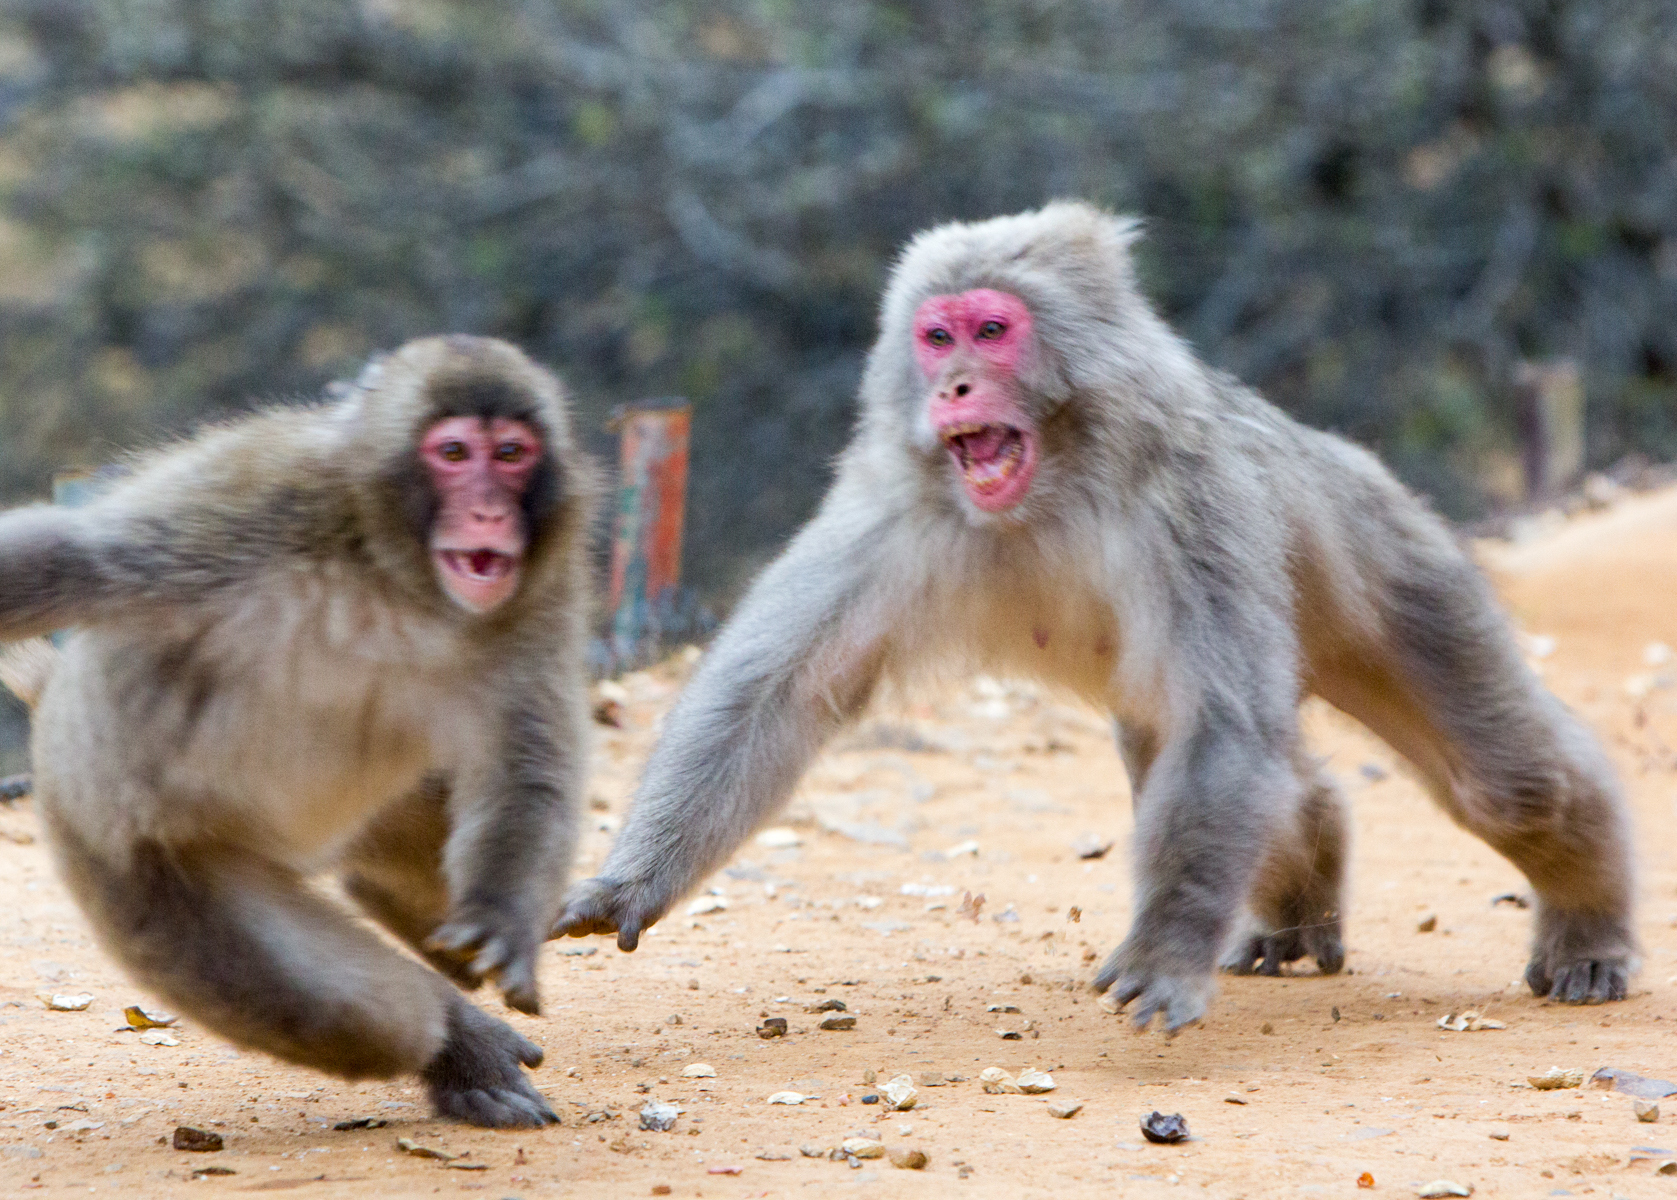 Dos primates pelean